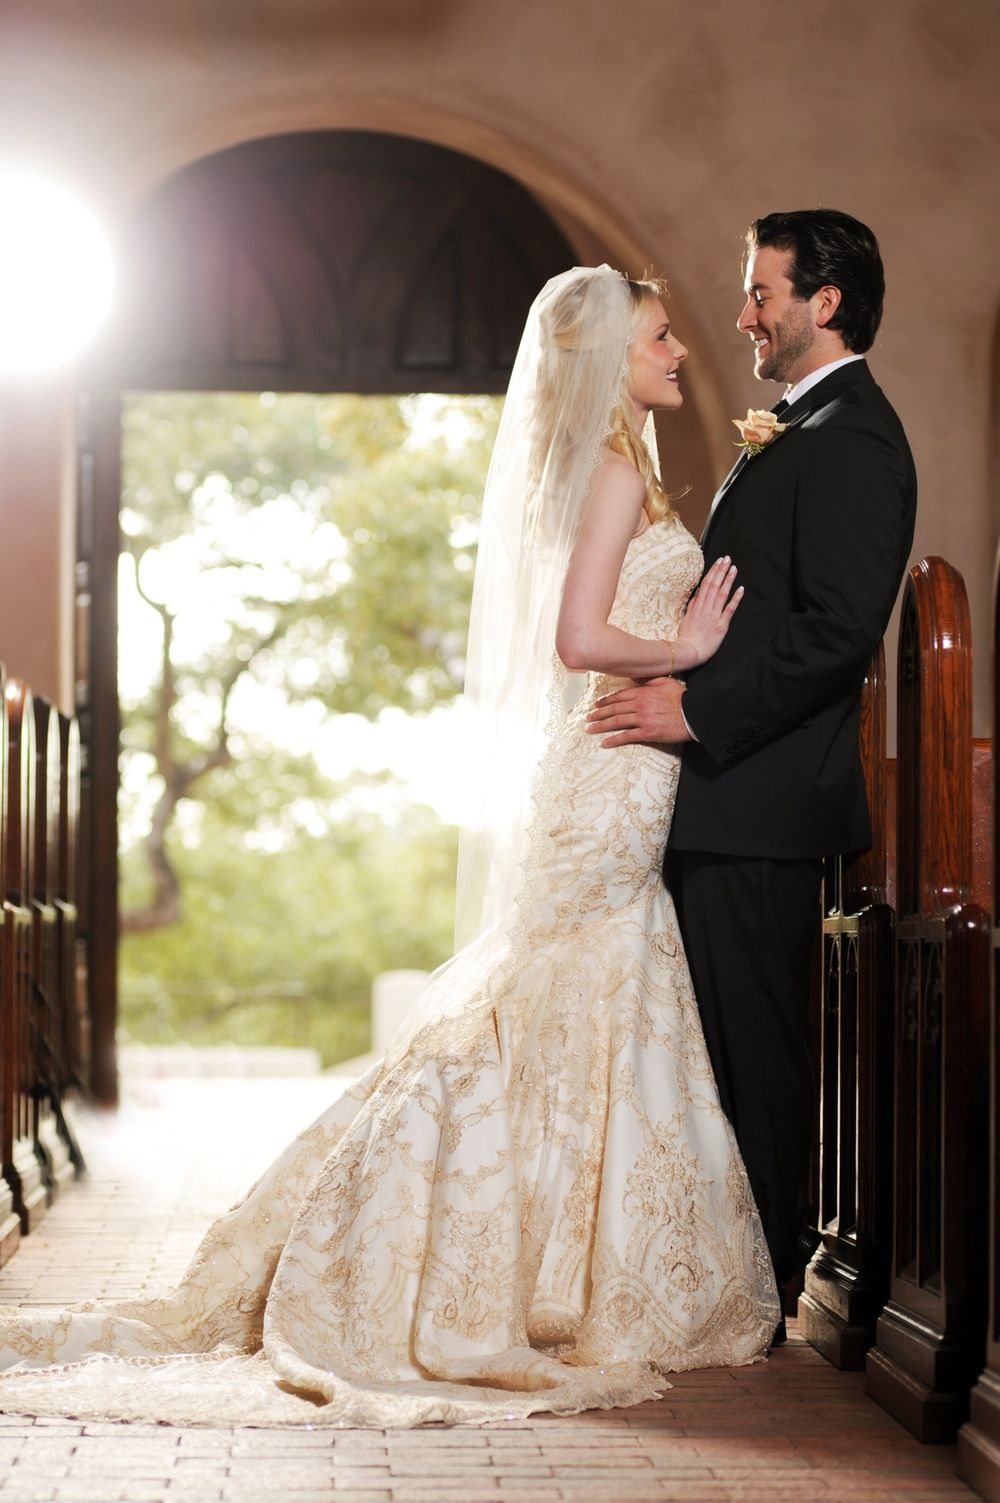 Spanish Inspired Wedding Lost Mission Photographer San Antonio Austin Texas